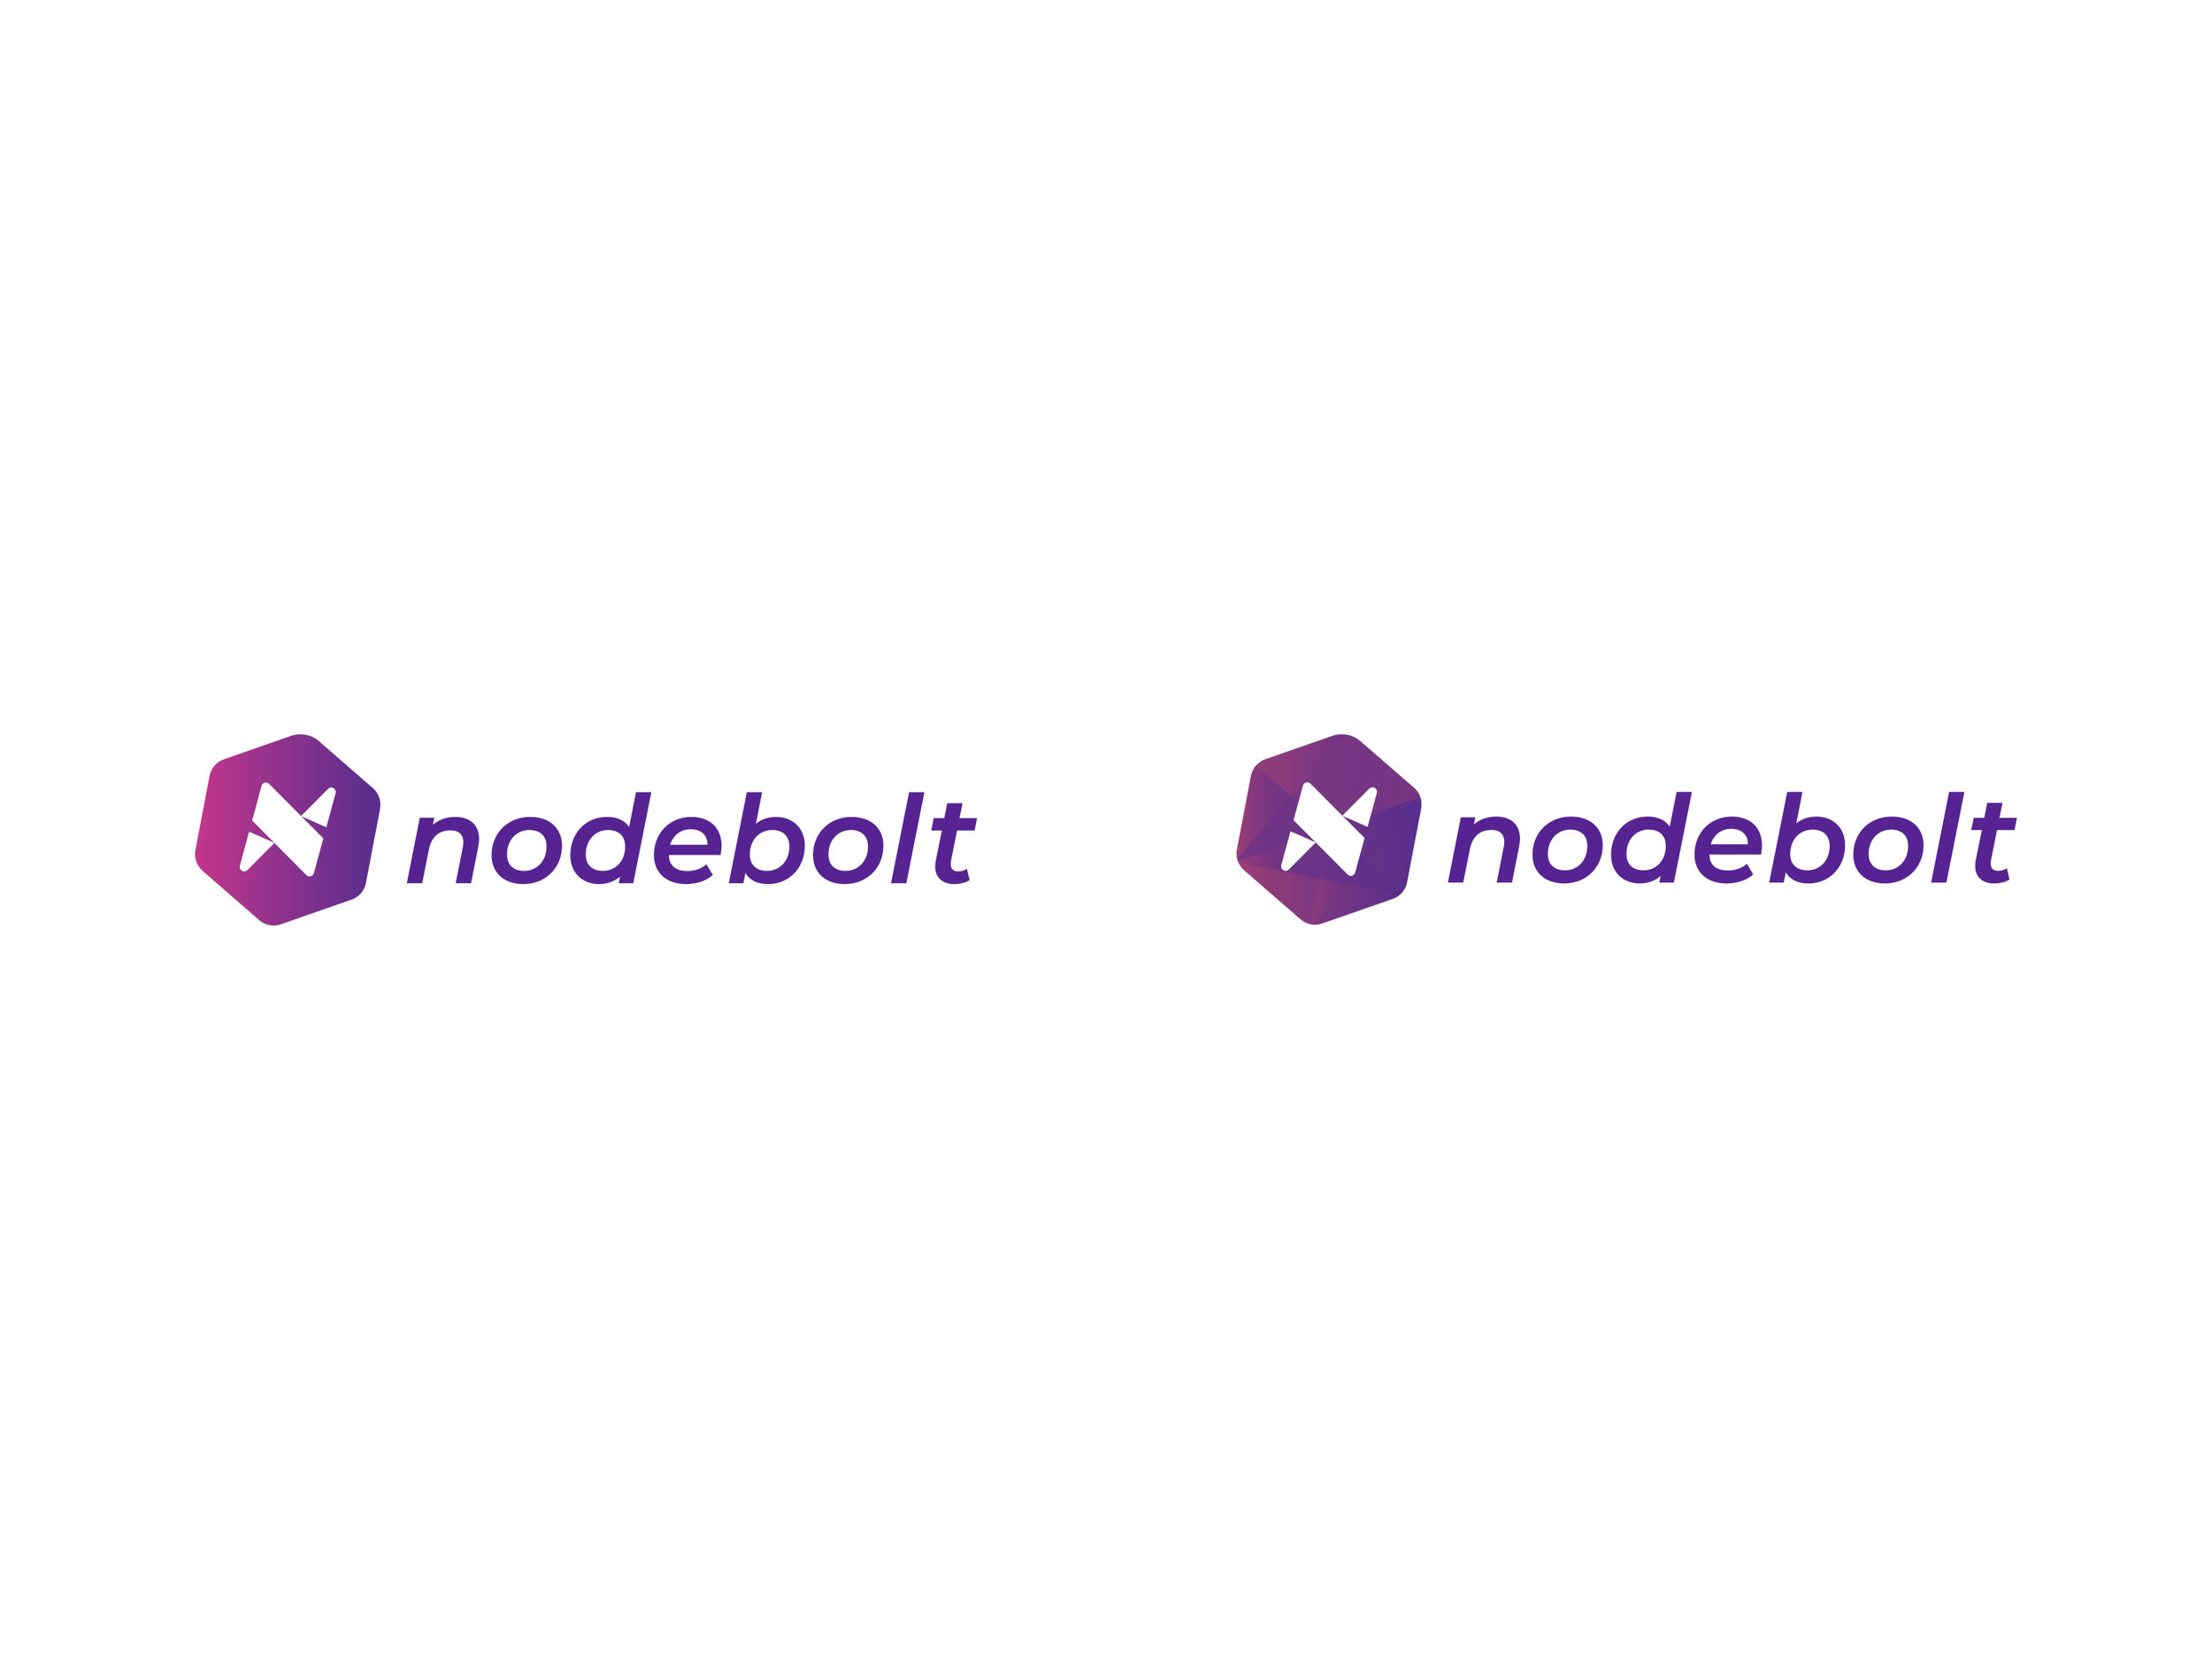 Nodebolt-Projectimage-06.jpg